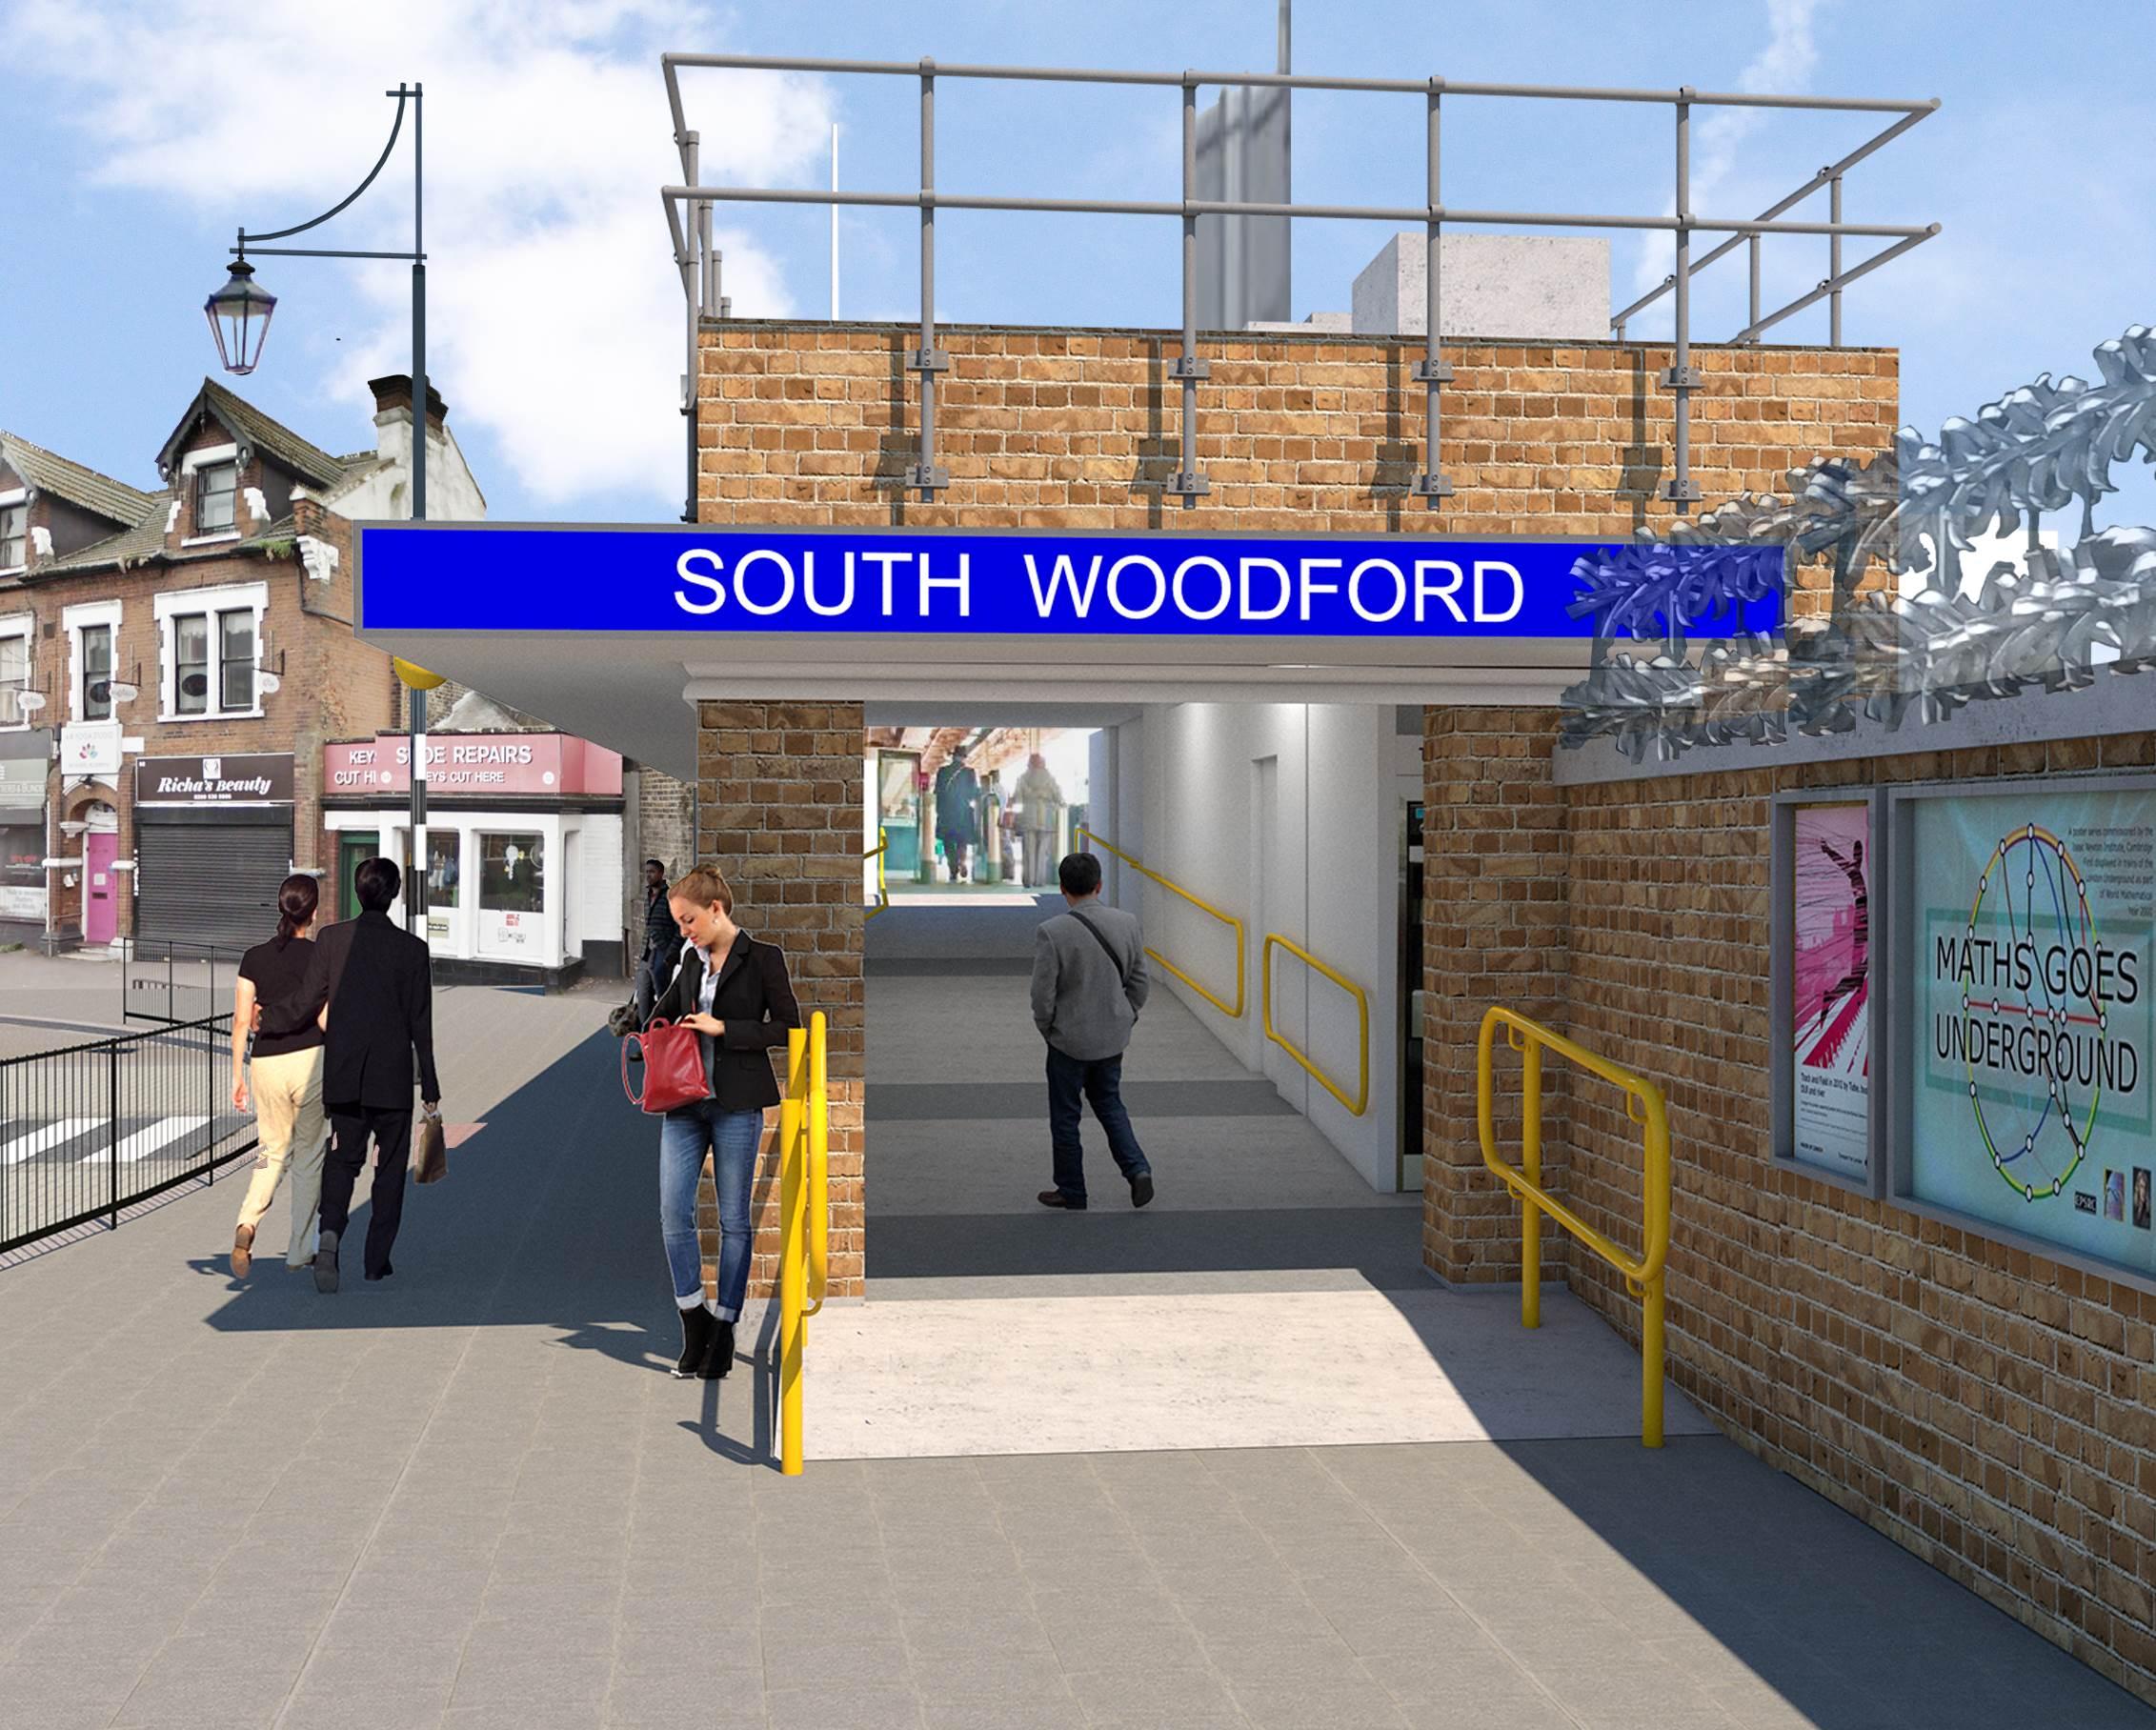 5015-3SFA-SouthWoodford (1).jpg